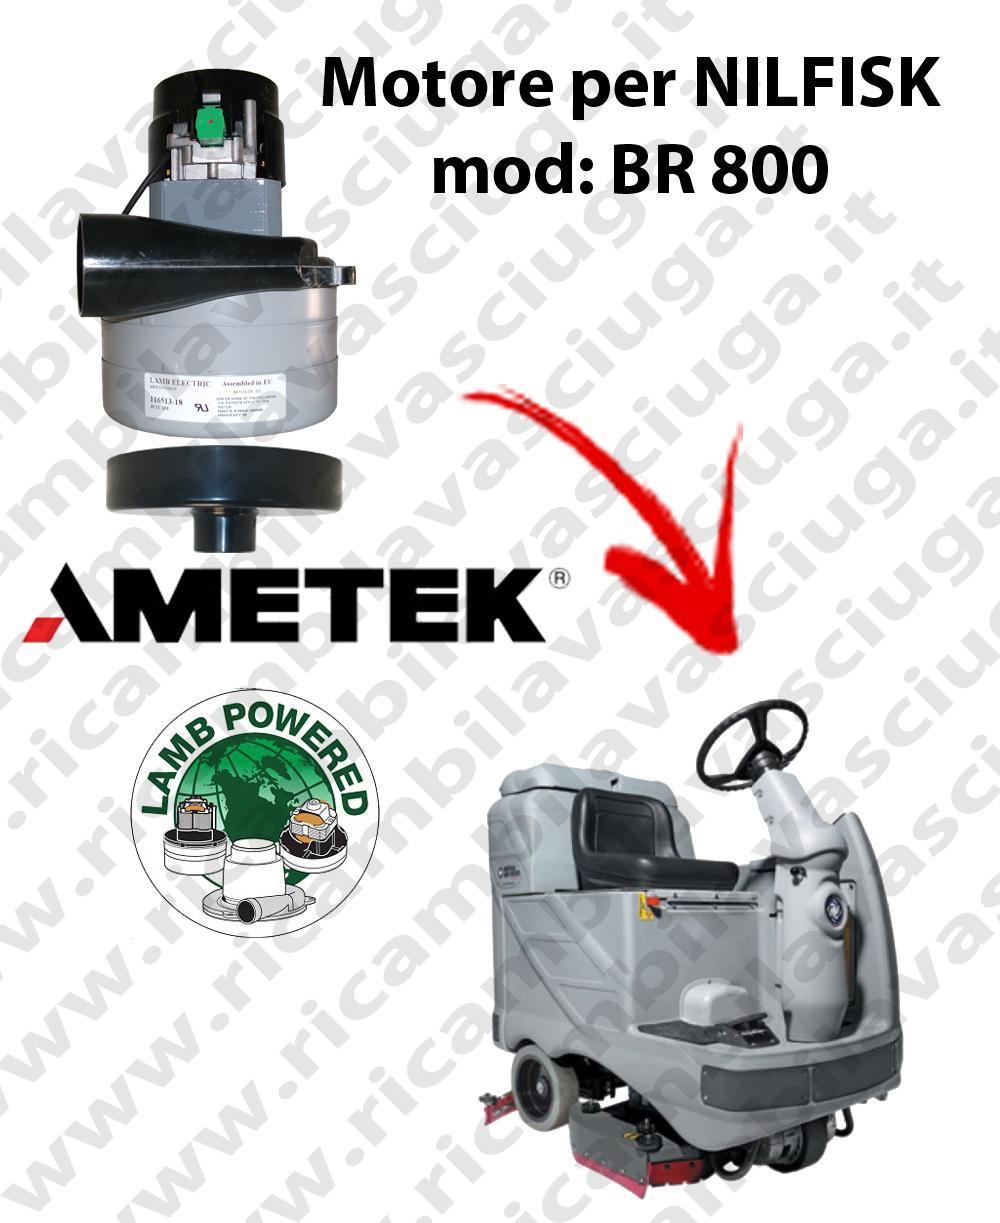 BR 800 Motore de aspiración LAMB AMETEK para fregadora NILFISK